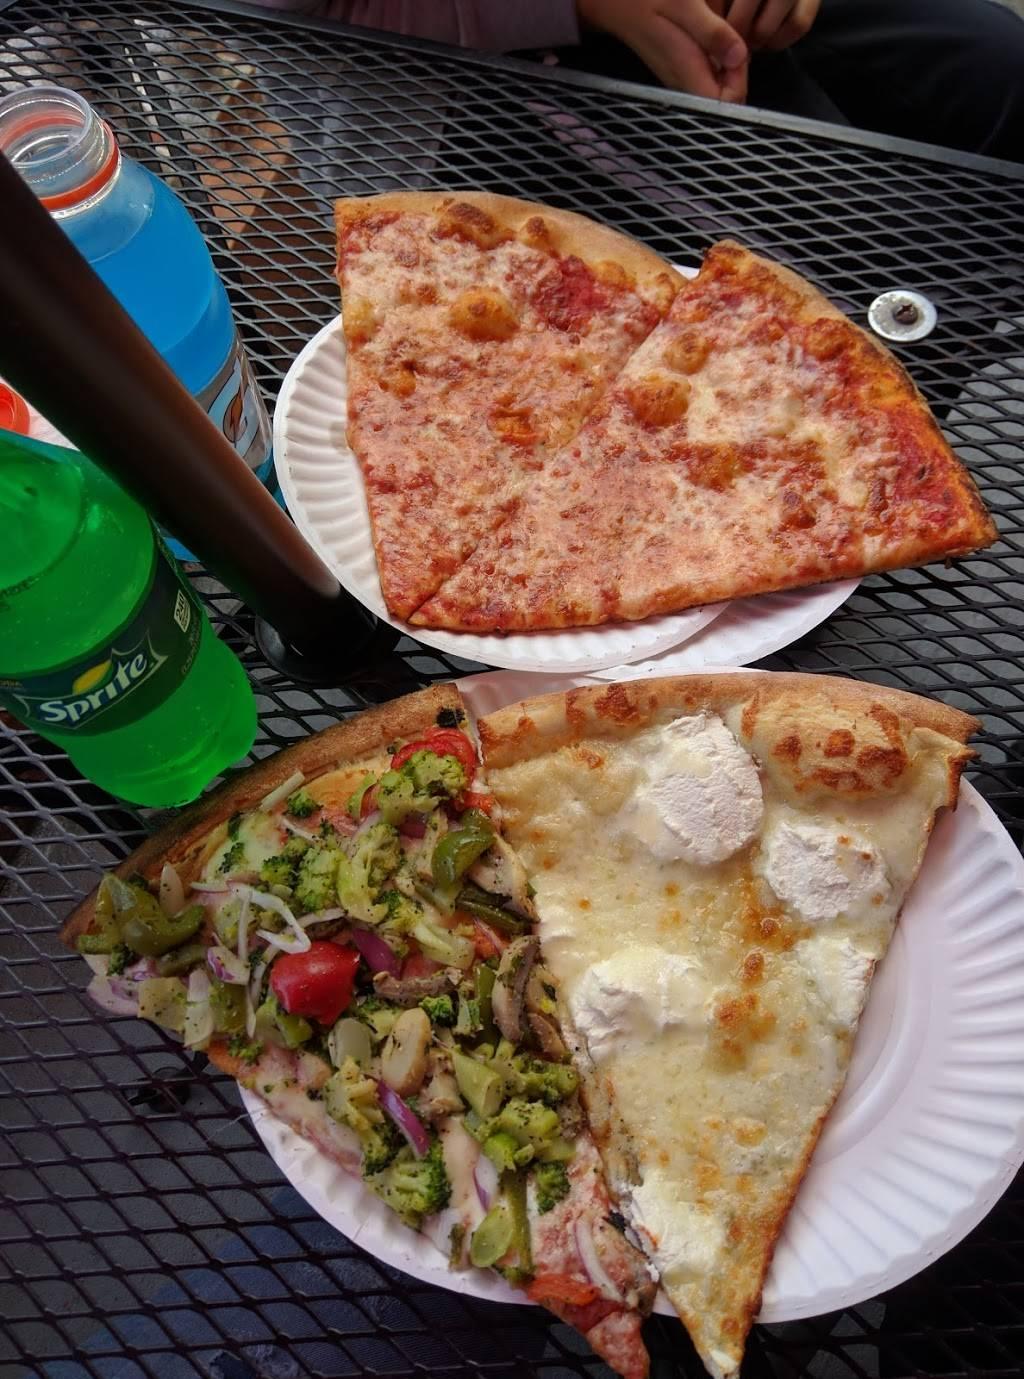 Rockys & Nickys Pizzeria II | restaurant | 6824 Colonial Rd #1, Brooklyn, NY 11220, USA | 7187451999 OR +1 718-745-1999